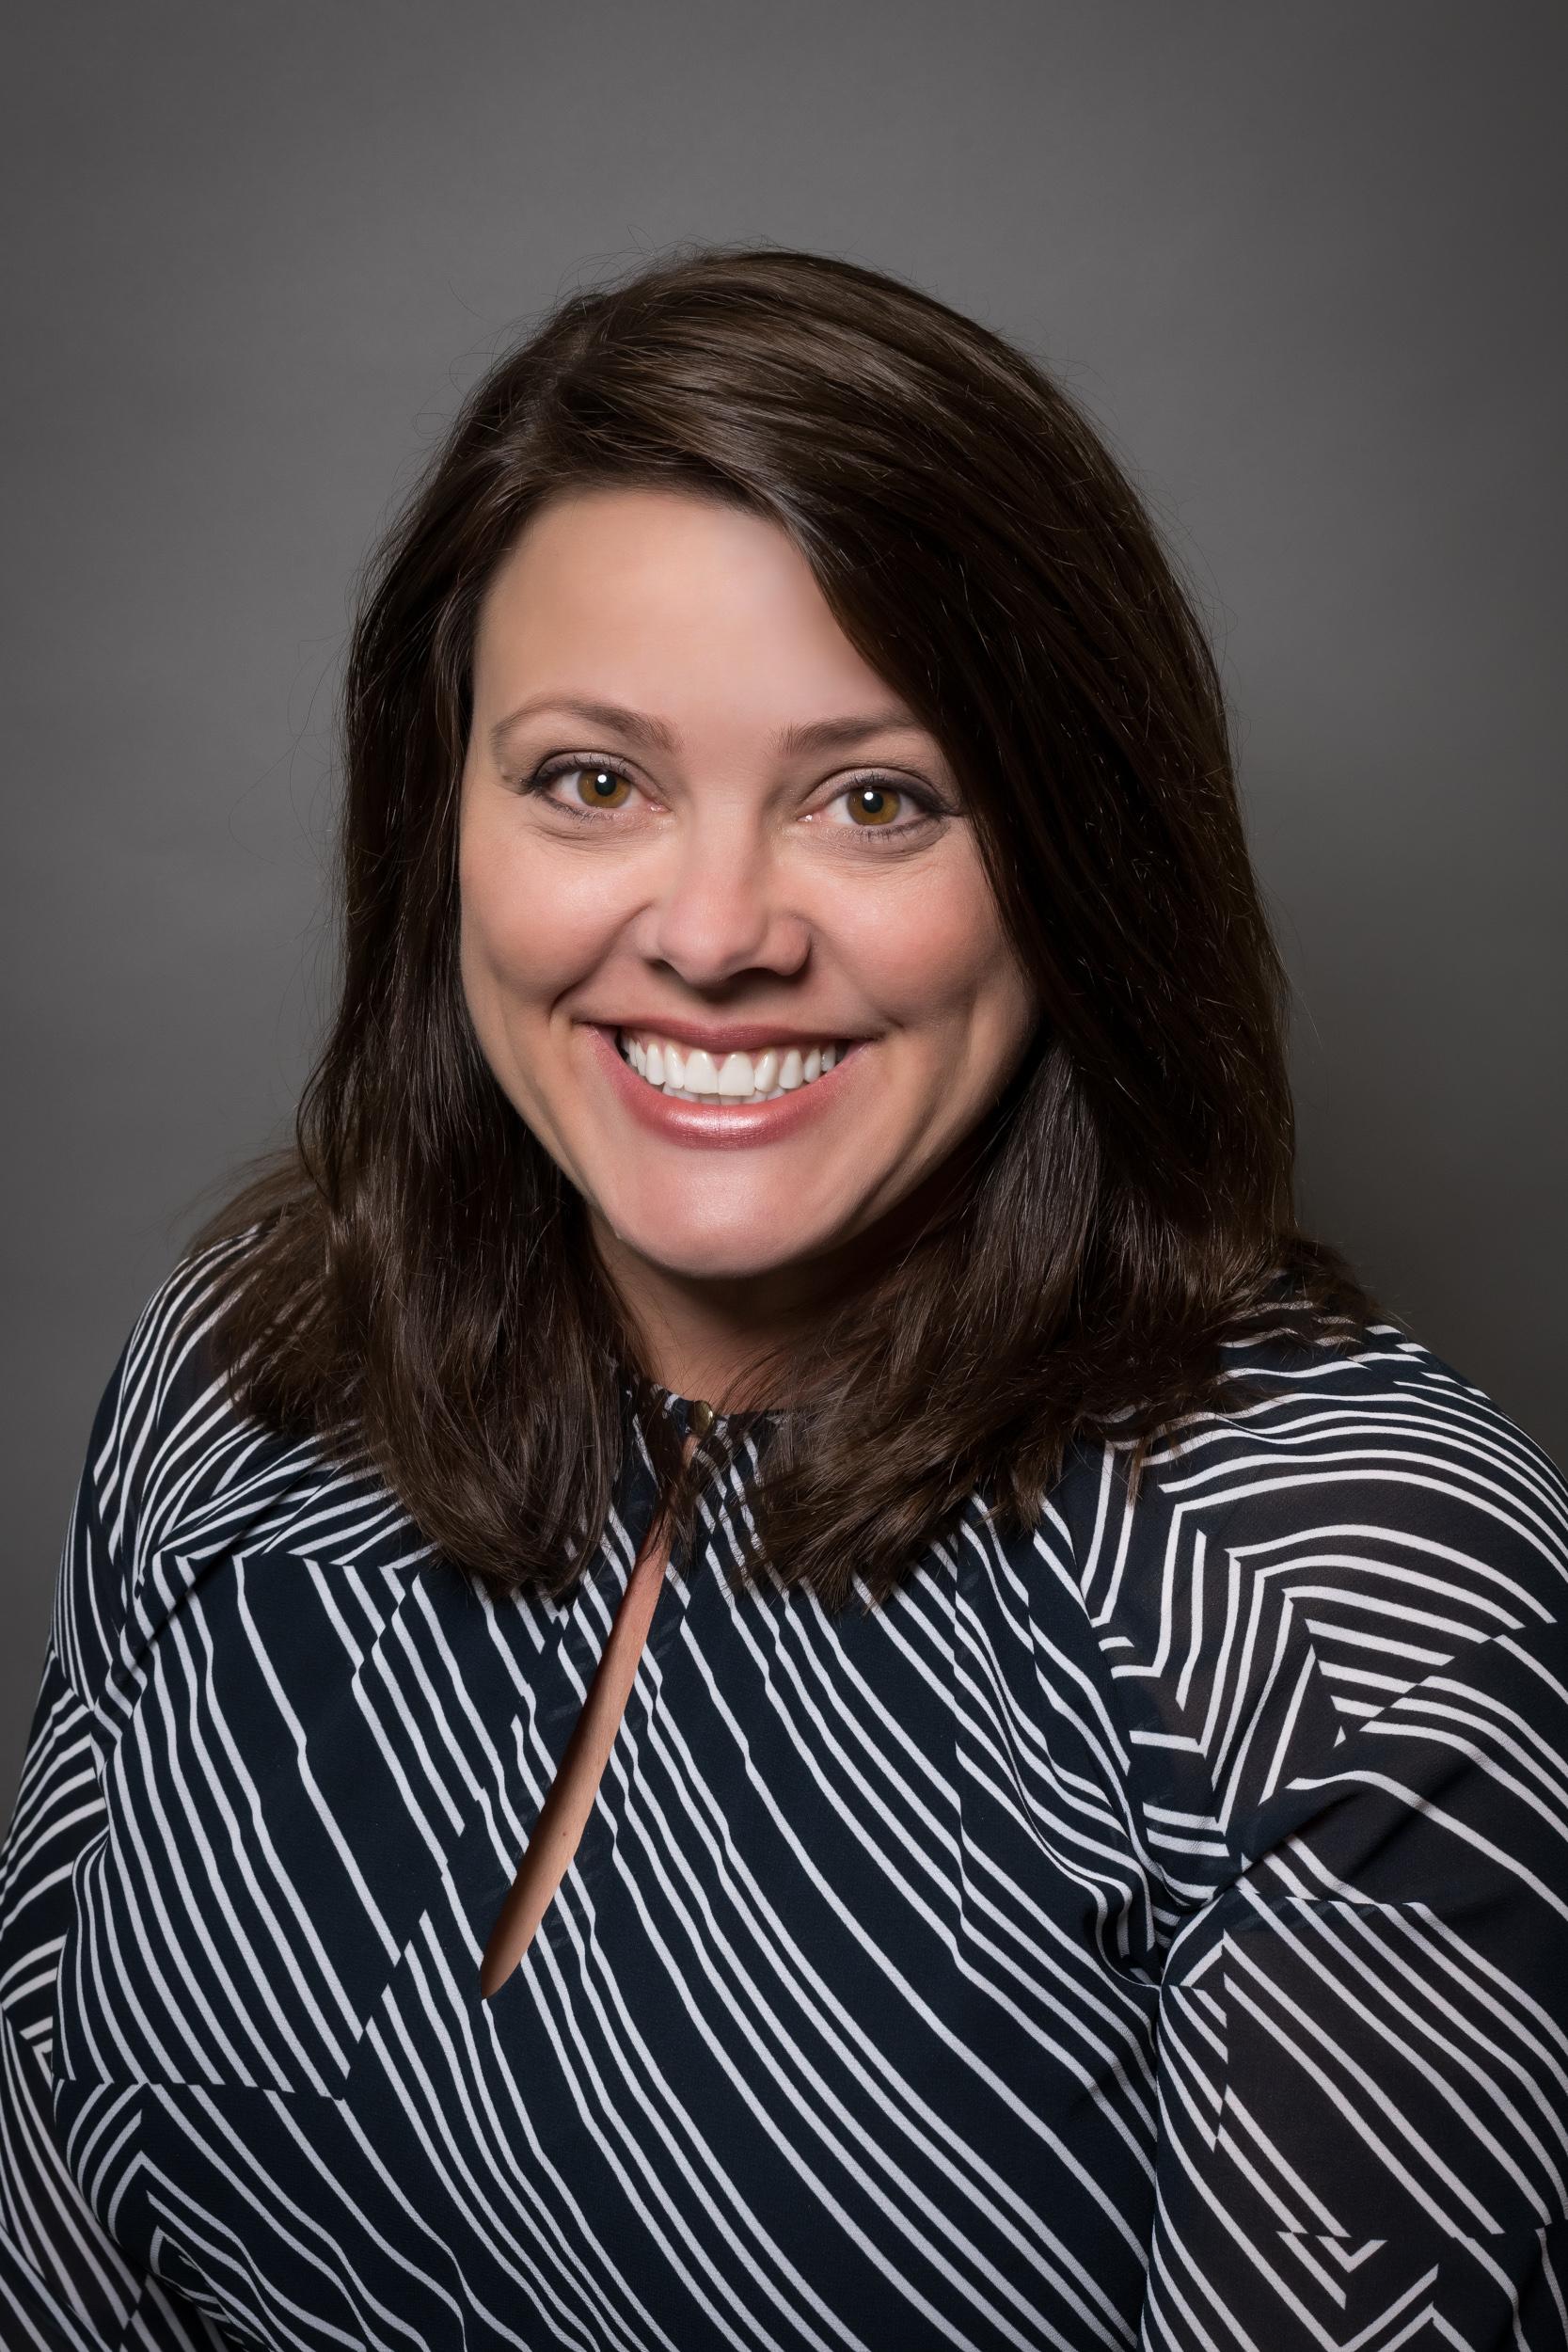 Melanie Gould - Assistant VP, Senior Loan Officer